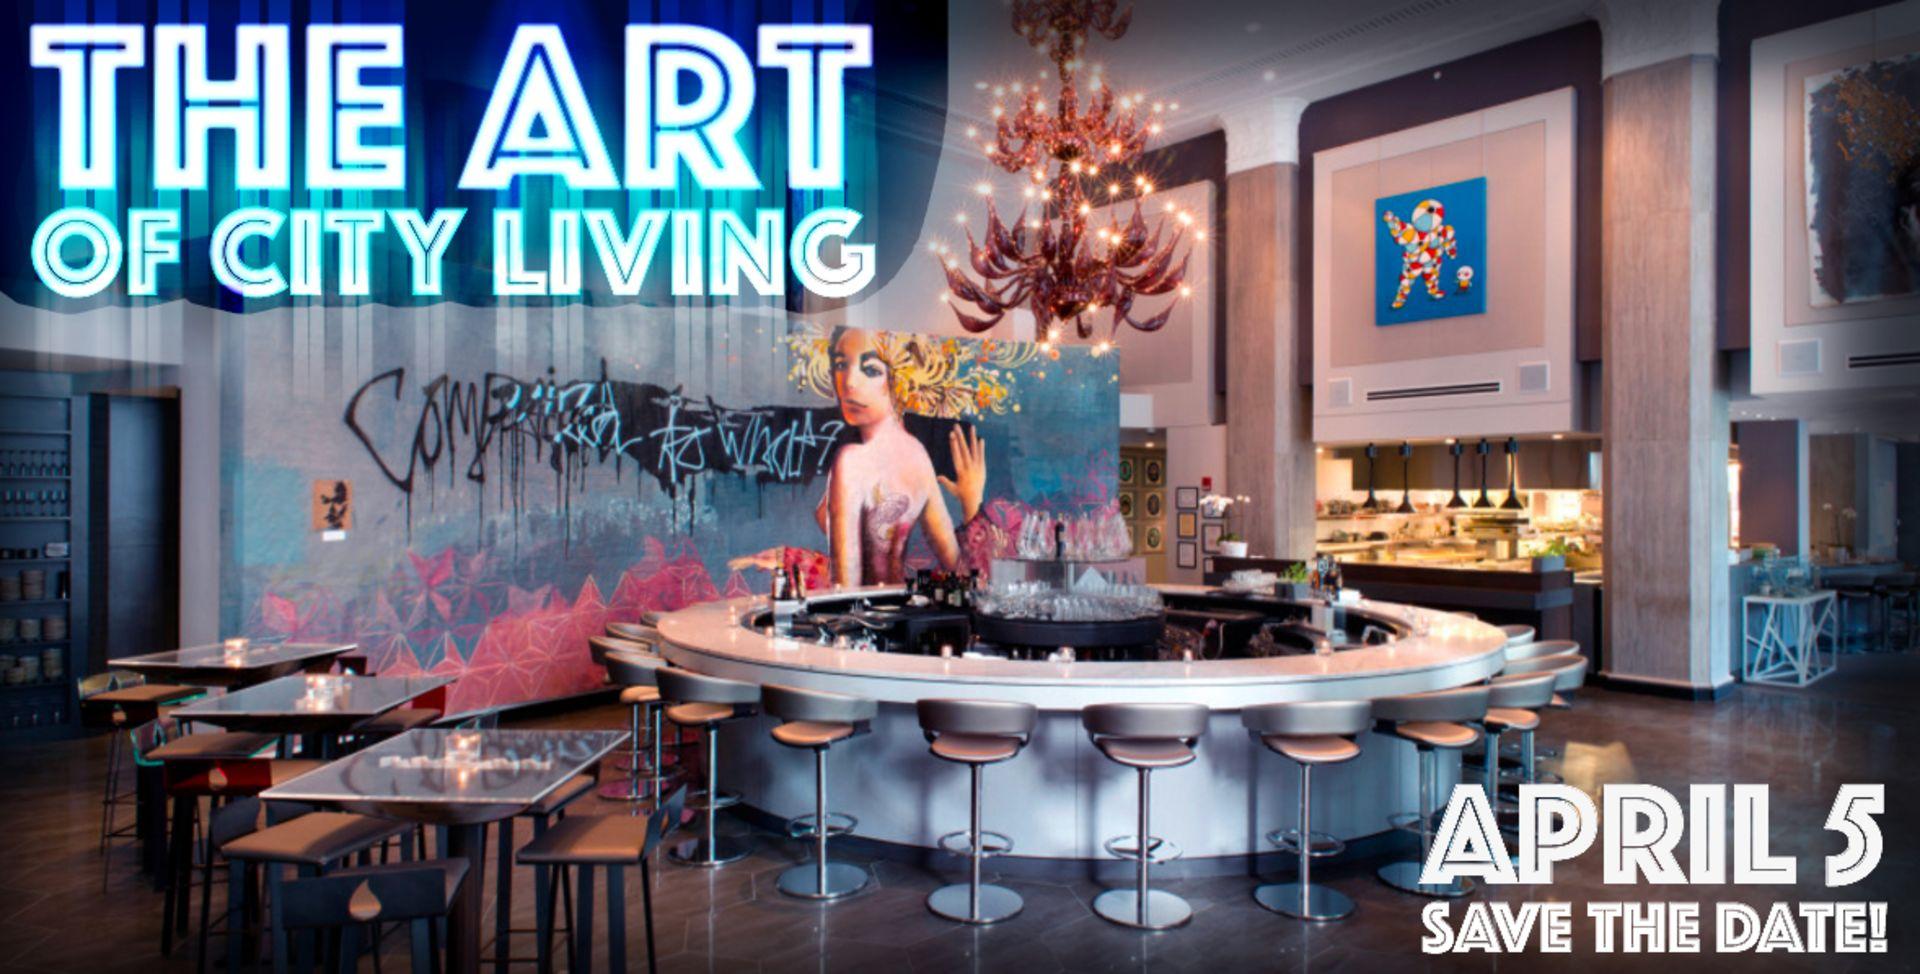 The Art of City Living